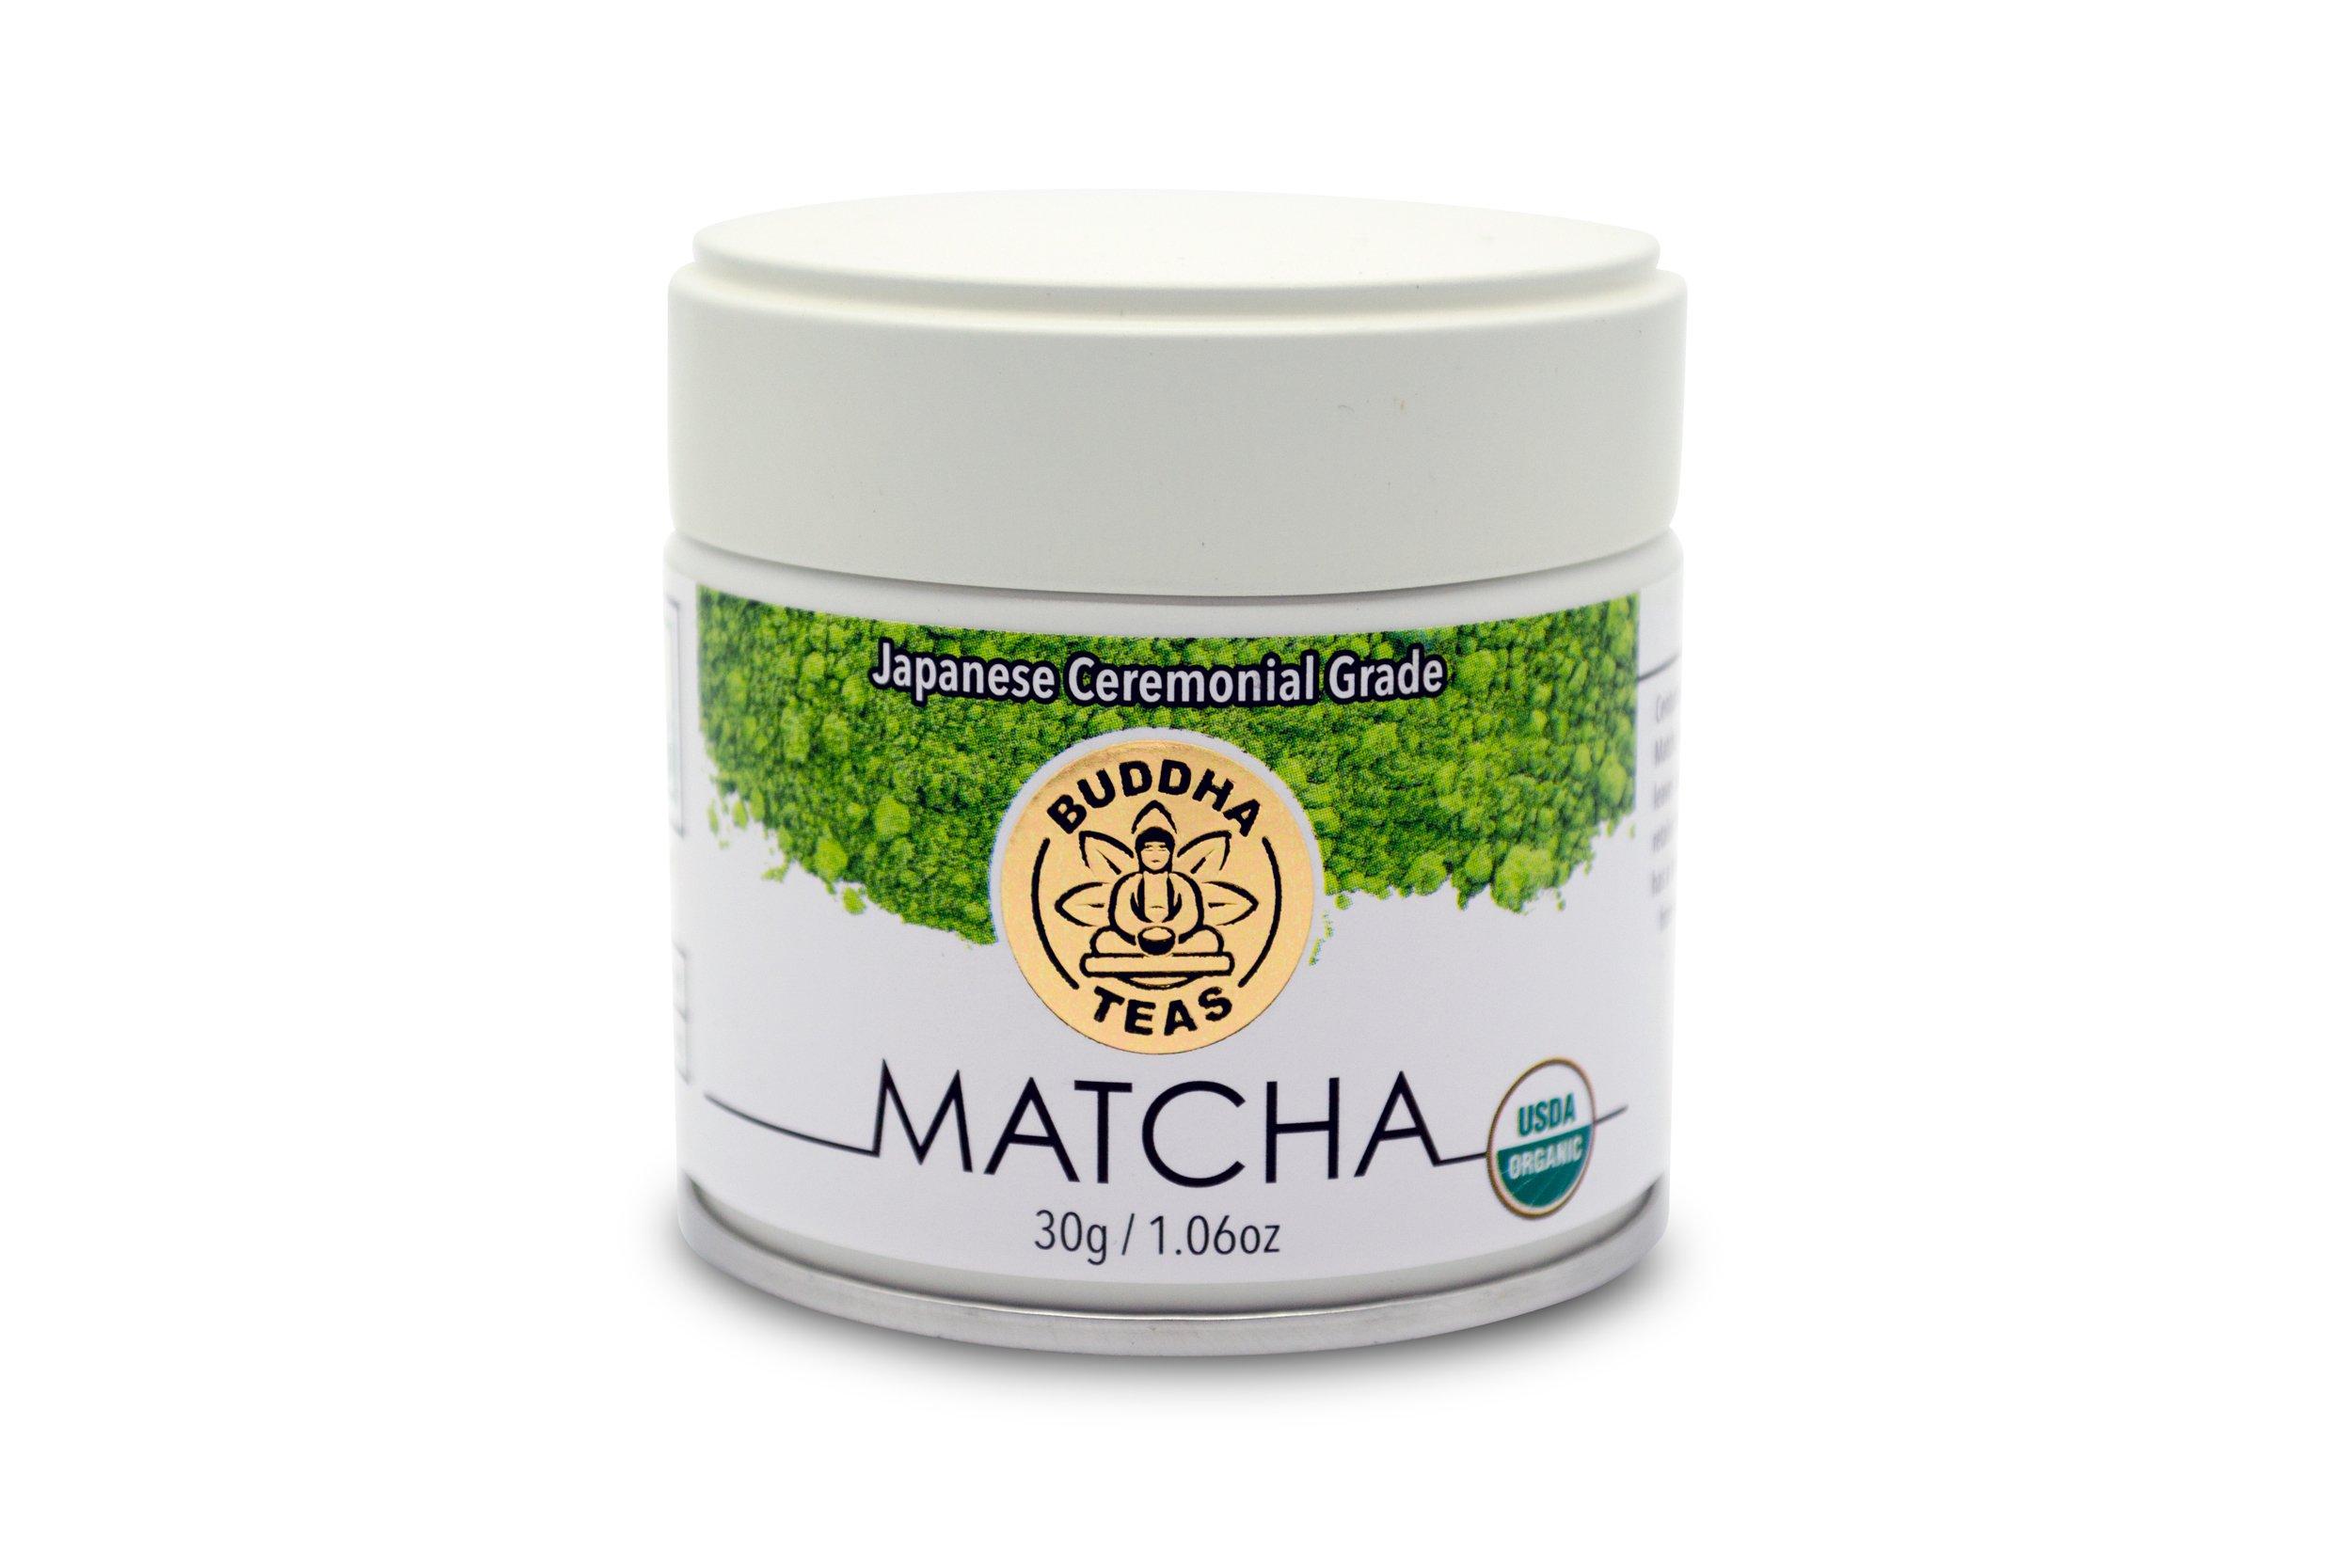 Premium Organic Japanese Ceremonial Grade Matcha Powder - (30 grams)